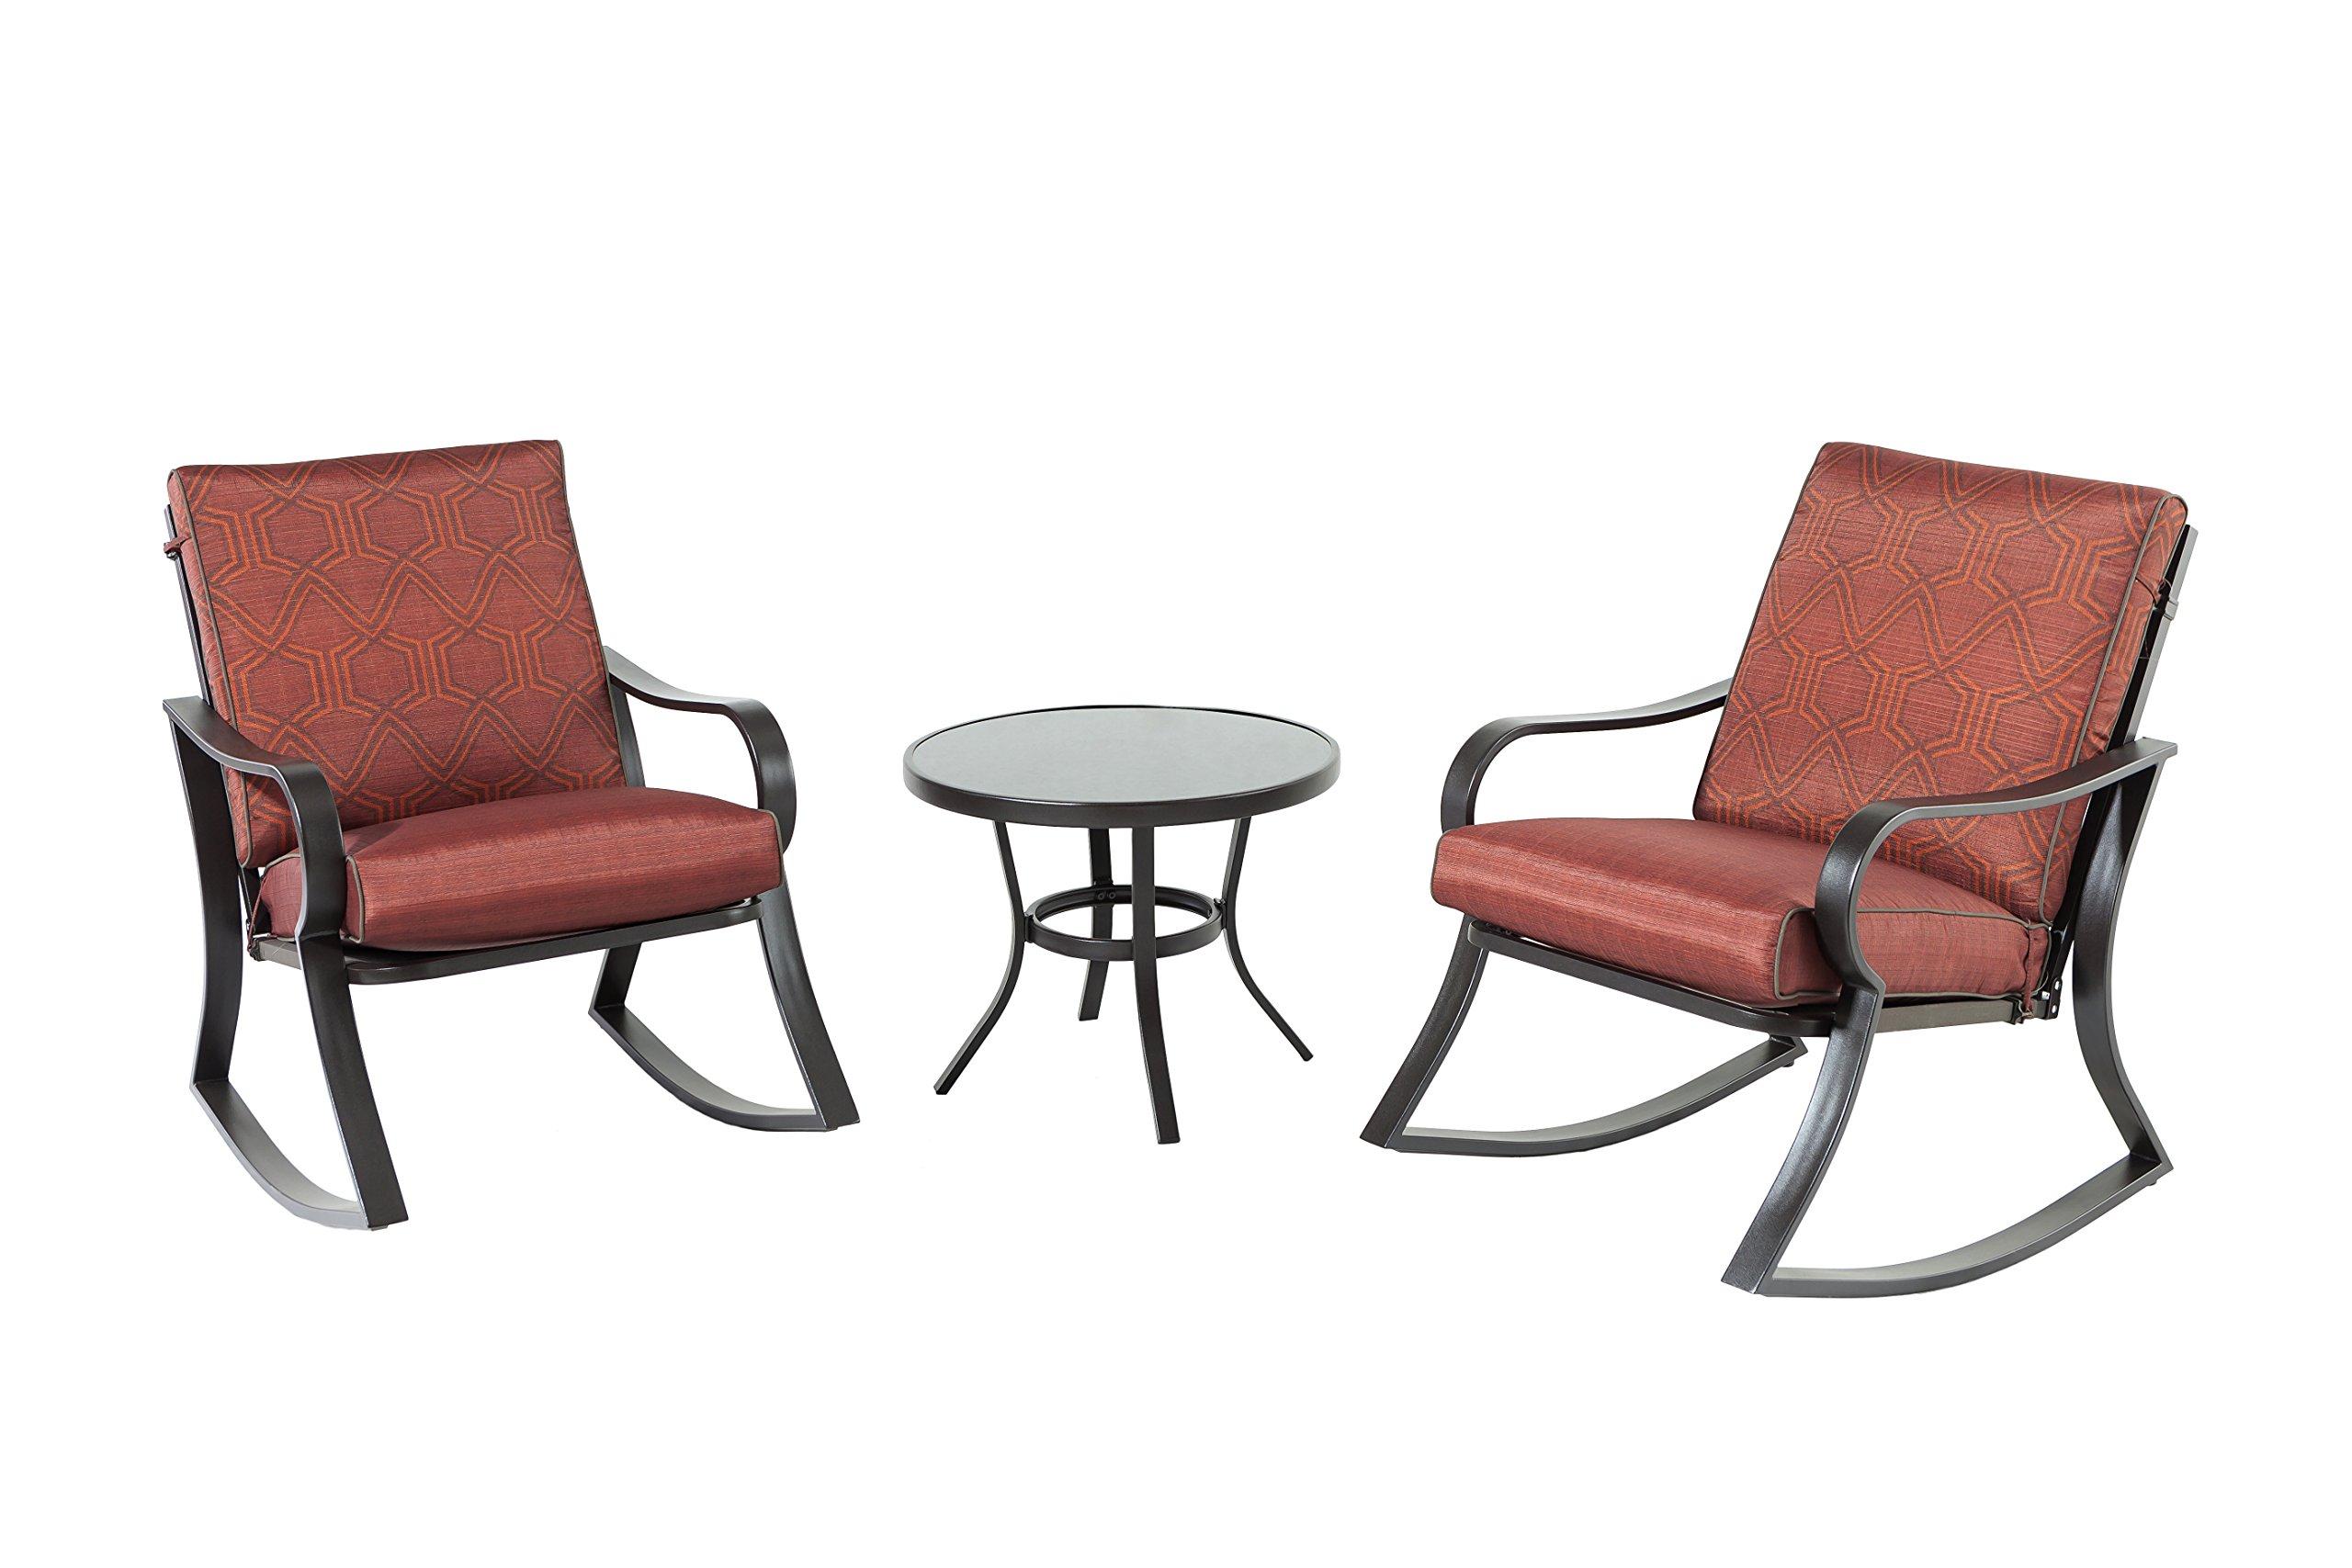 Backyard Classics Carrie 3-Piece Cushion Rocker Chair Set, Red